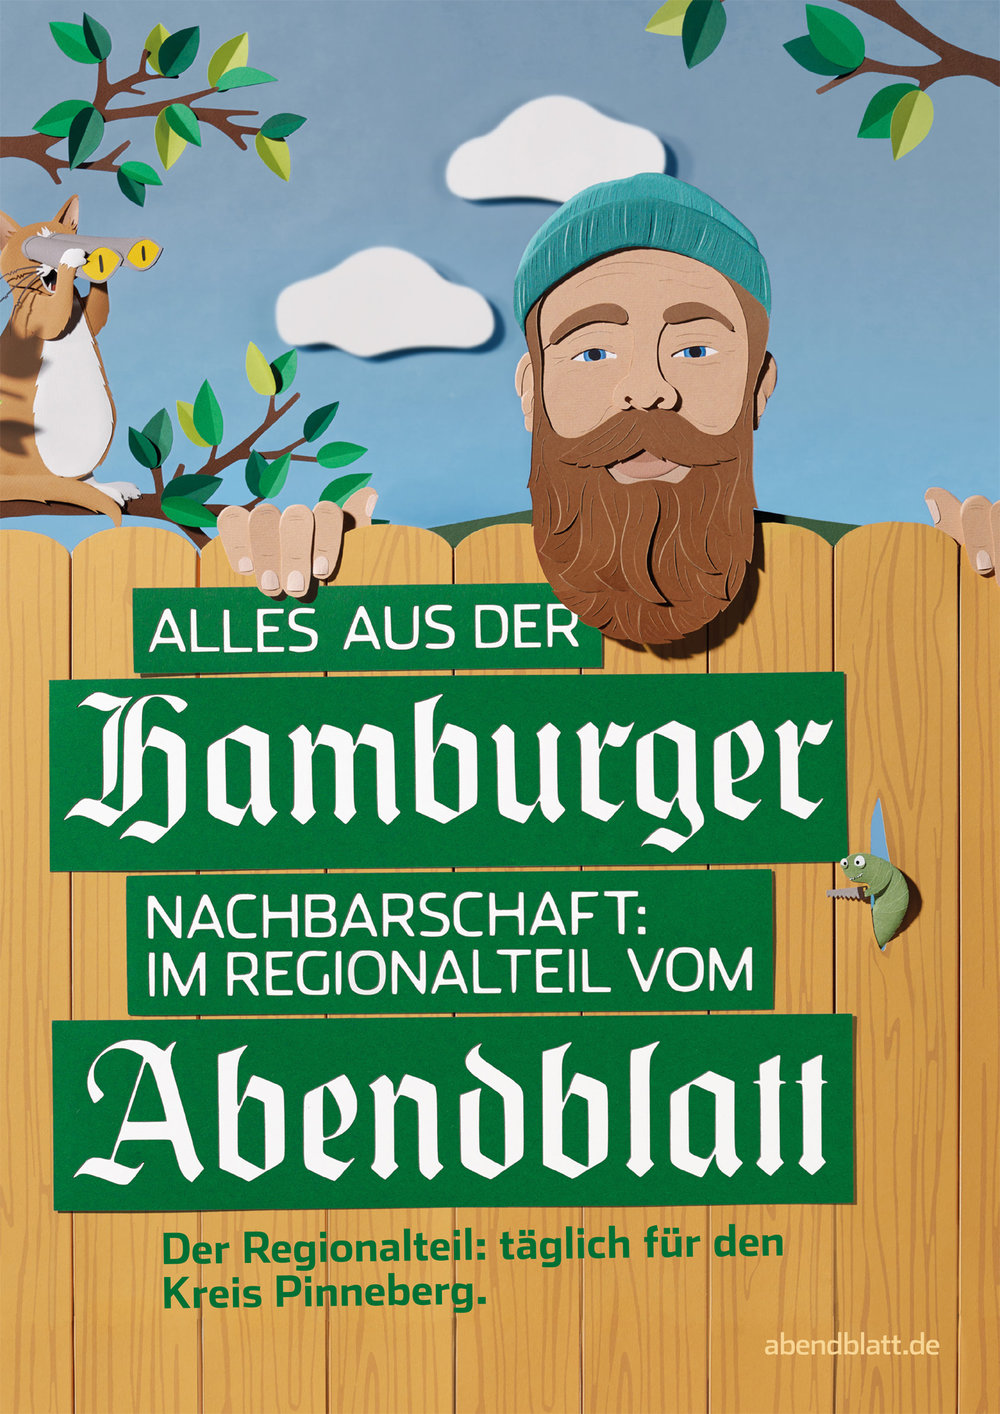 hamburger abendblatt plakat Hochformat WRK Imagekampagne Oliver Voss.jpg